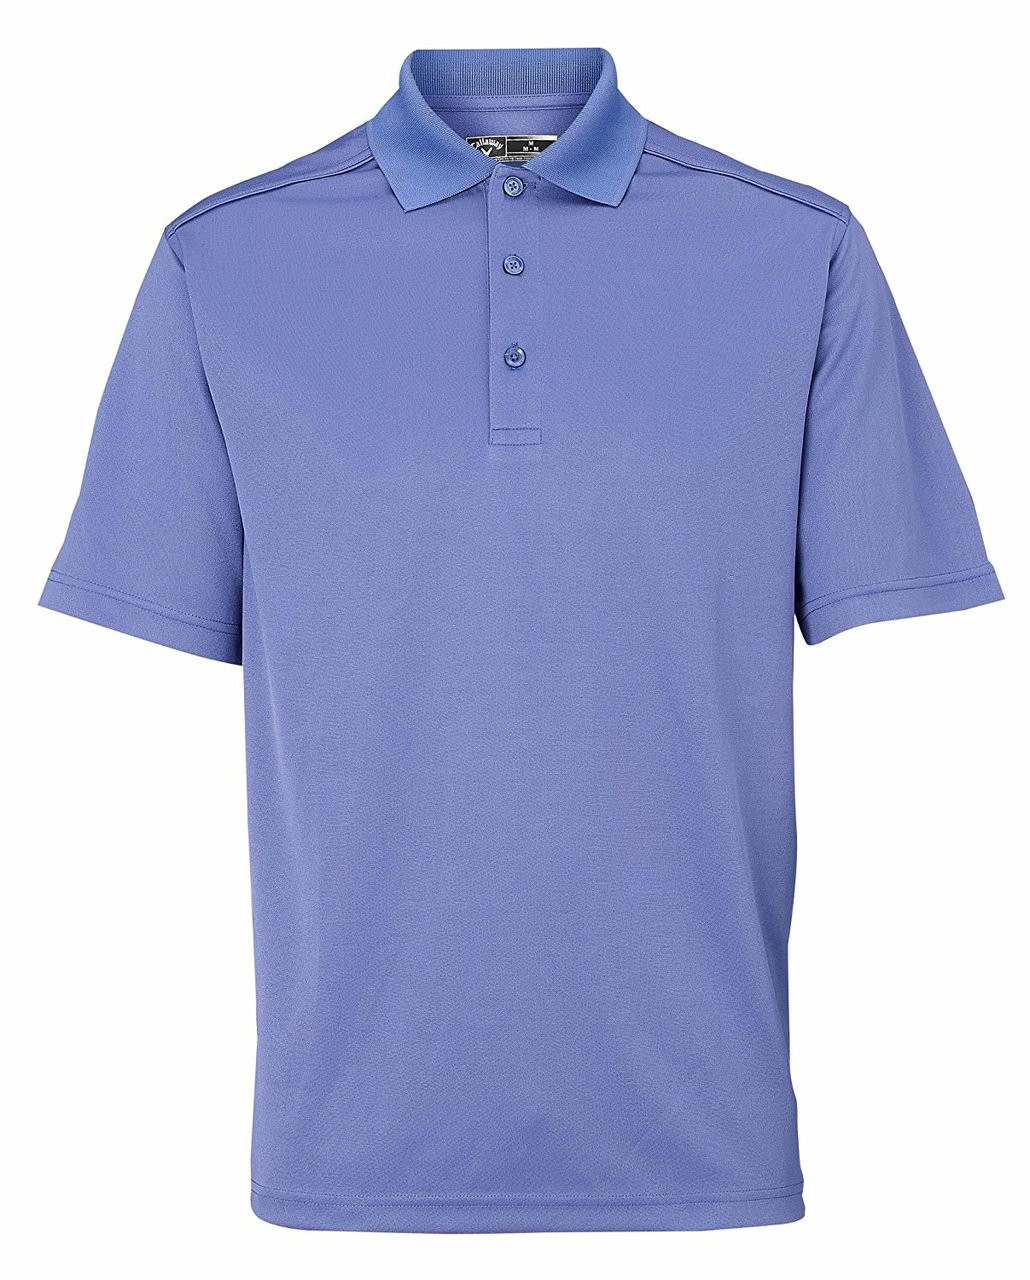 7f6d89a62 Callaway Mens Golf Chev Polo Shirt Deep Ultramarine Small - London Pro Golf